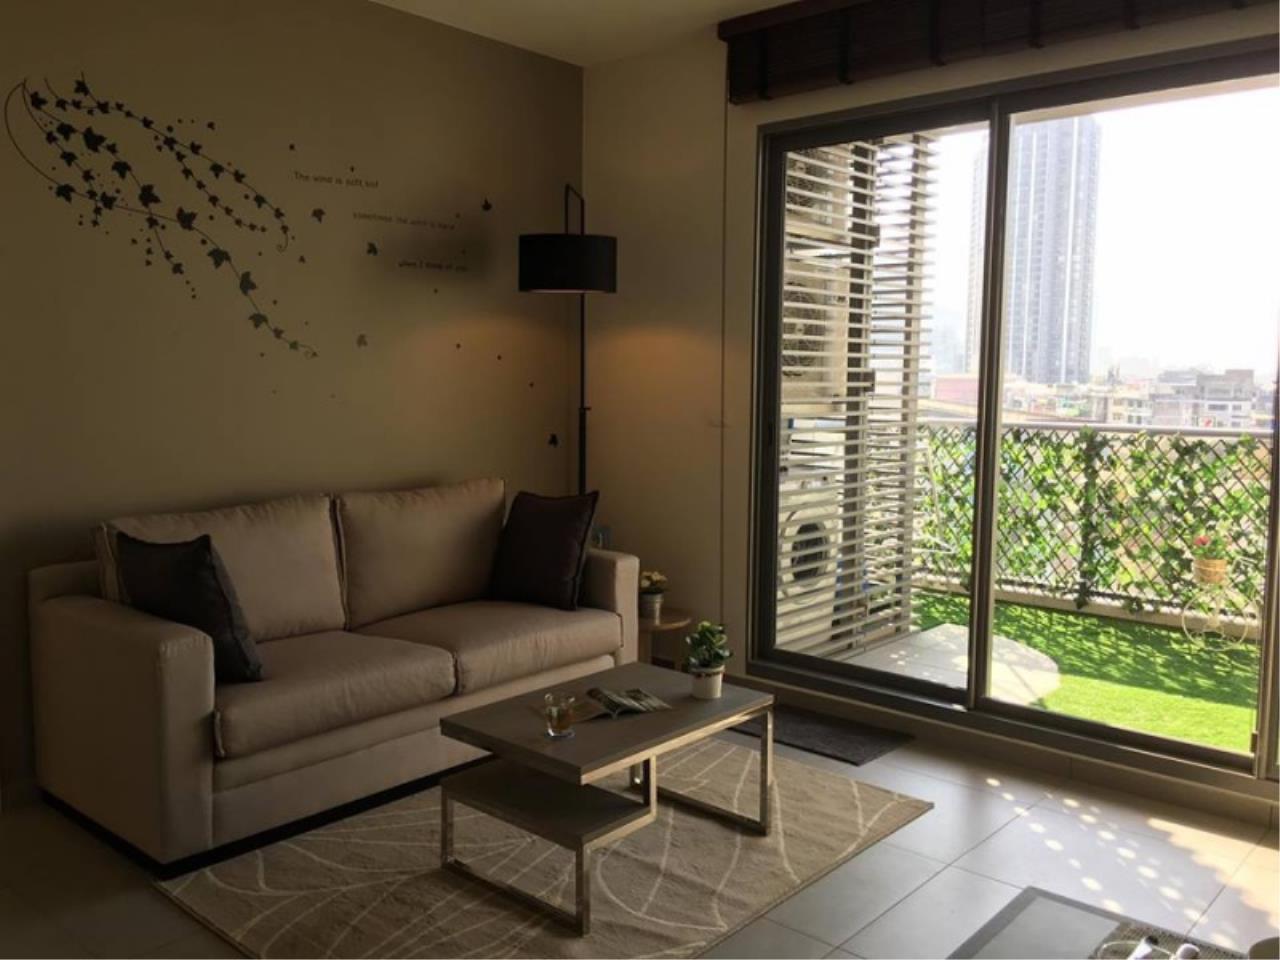 Century21 Skylux Agency's The Lofts Ekkamai / Condo For Sale / 1 Bedroom / 51 SQM / BTS Ekkamai / Bangkok 8